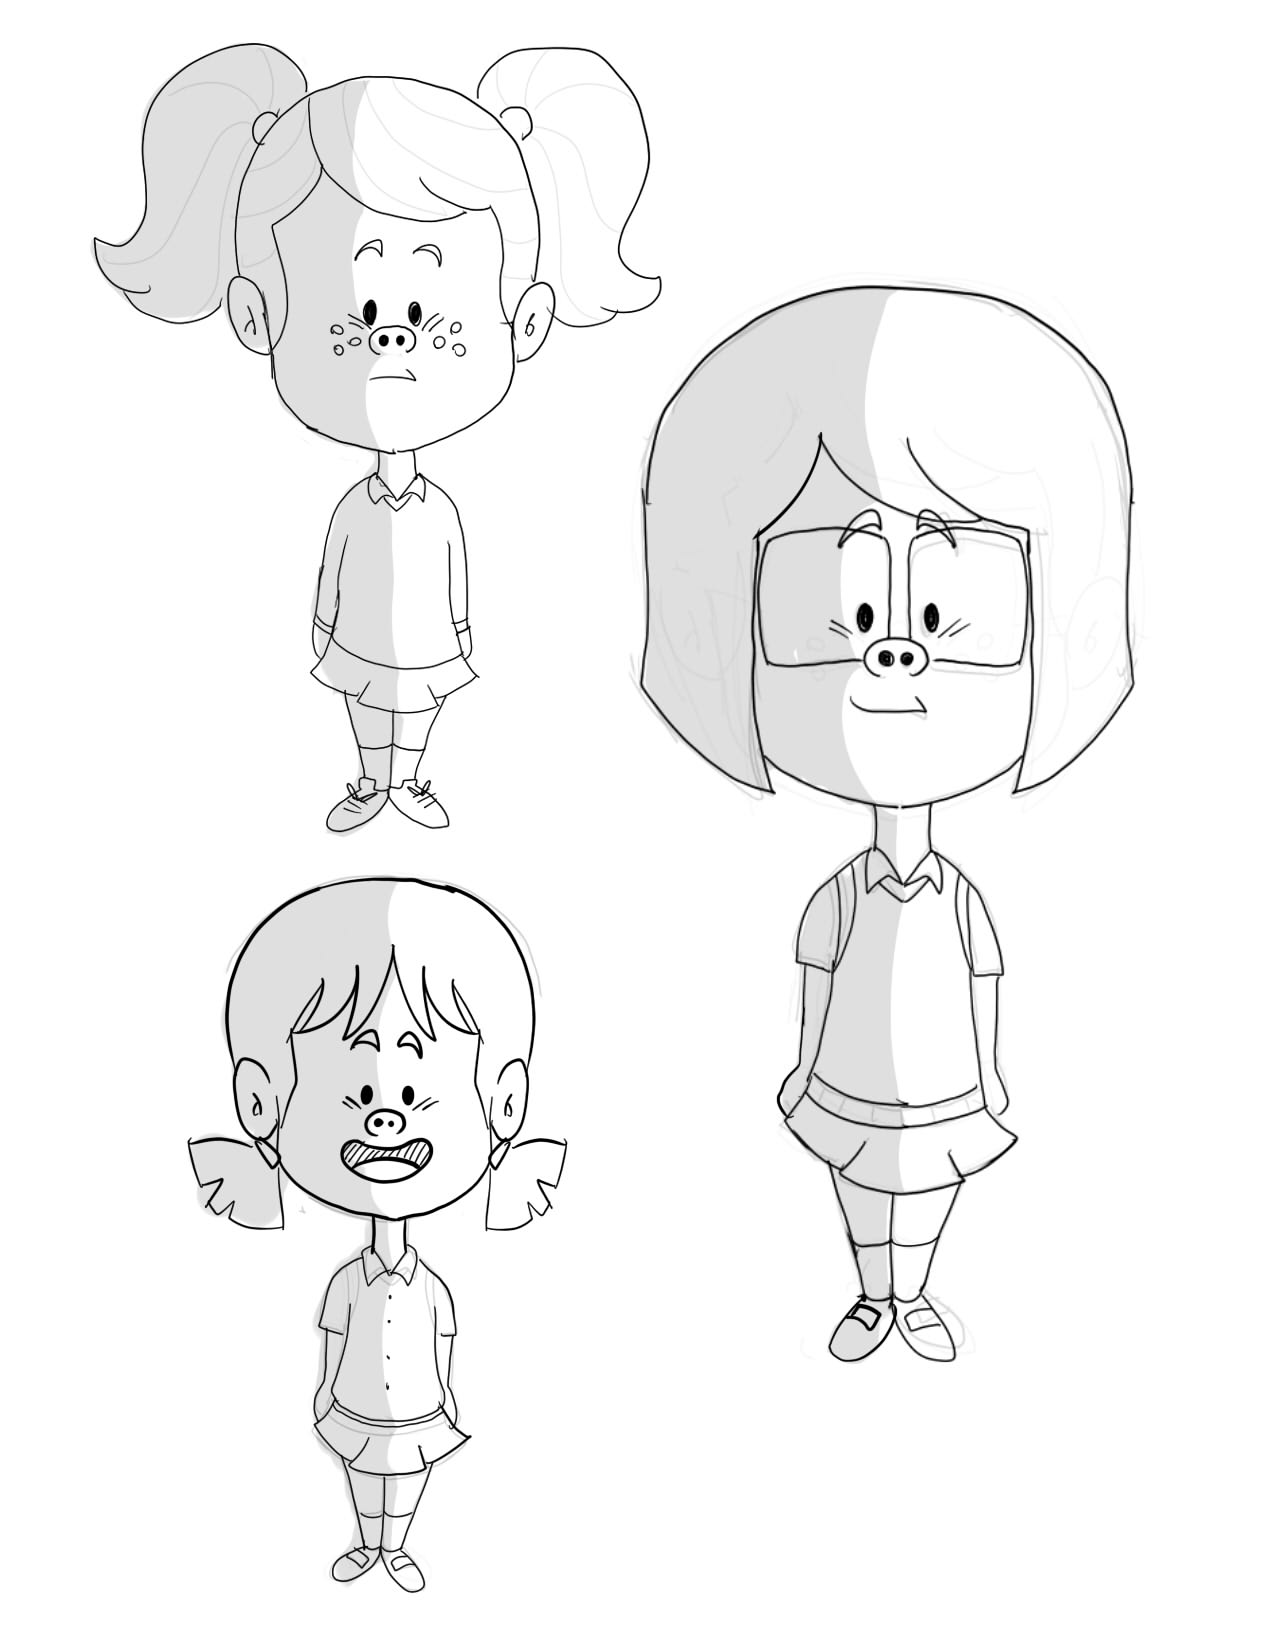 random sketches 188.jpg